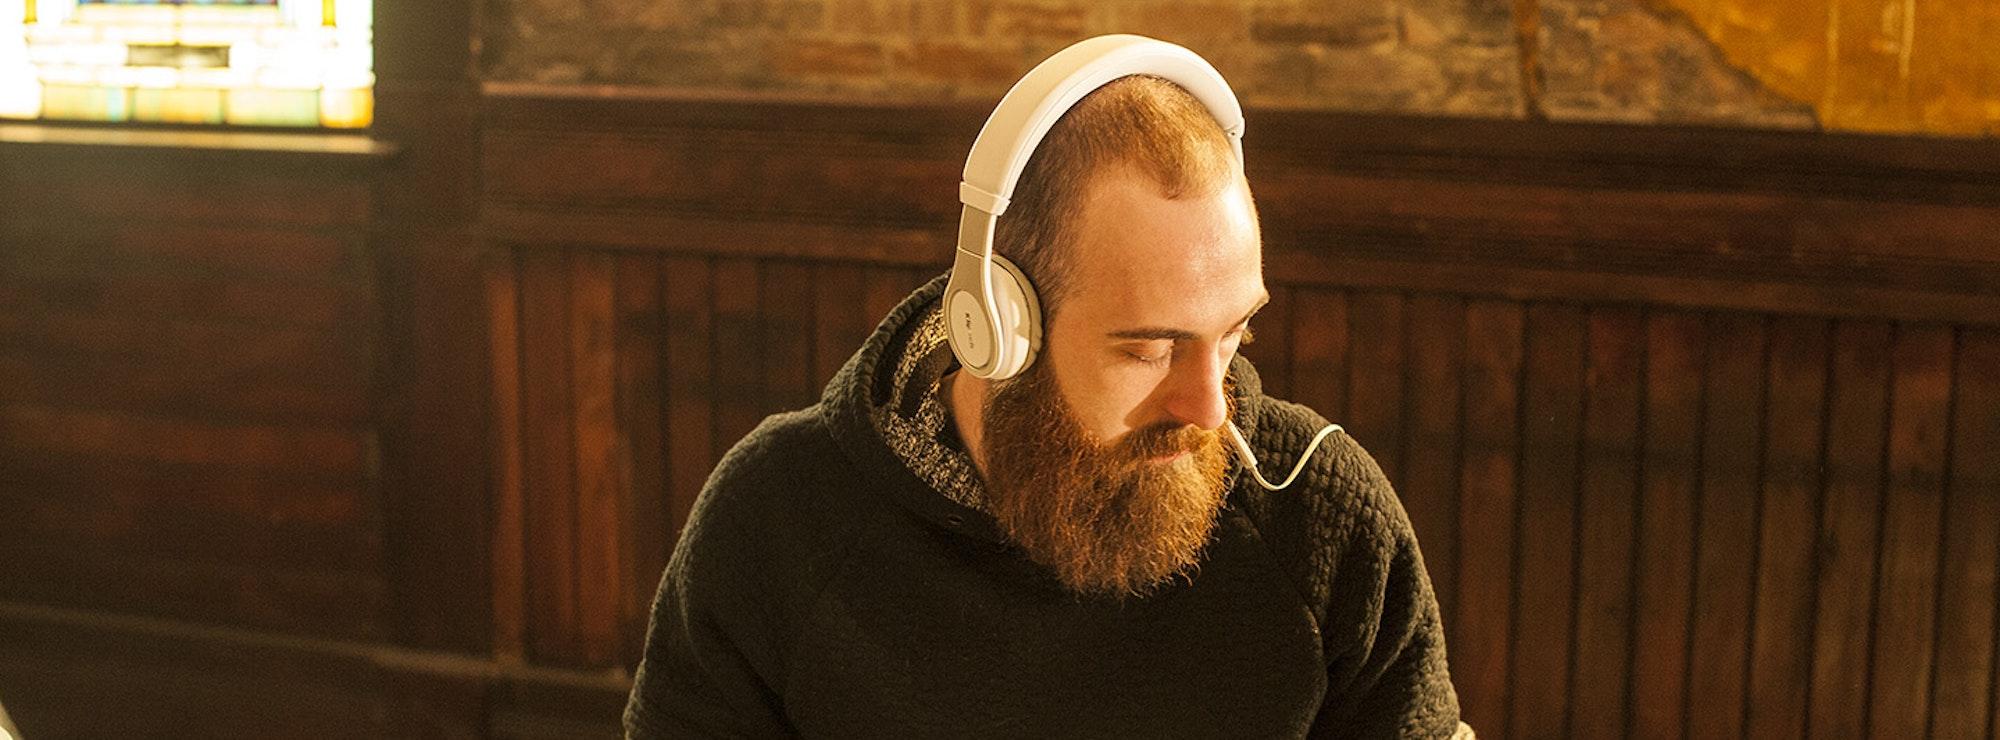 Bearded man listening to Klipsch headphones